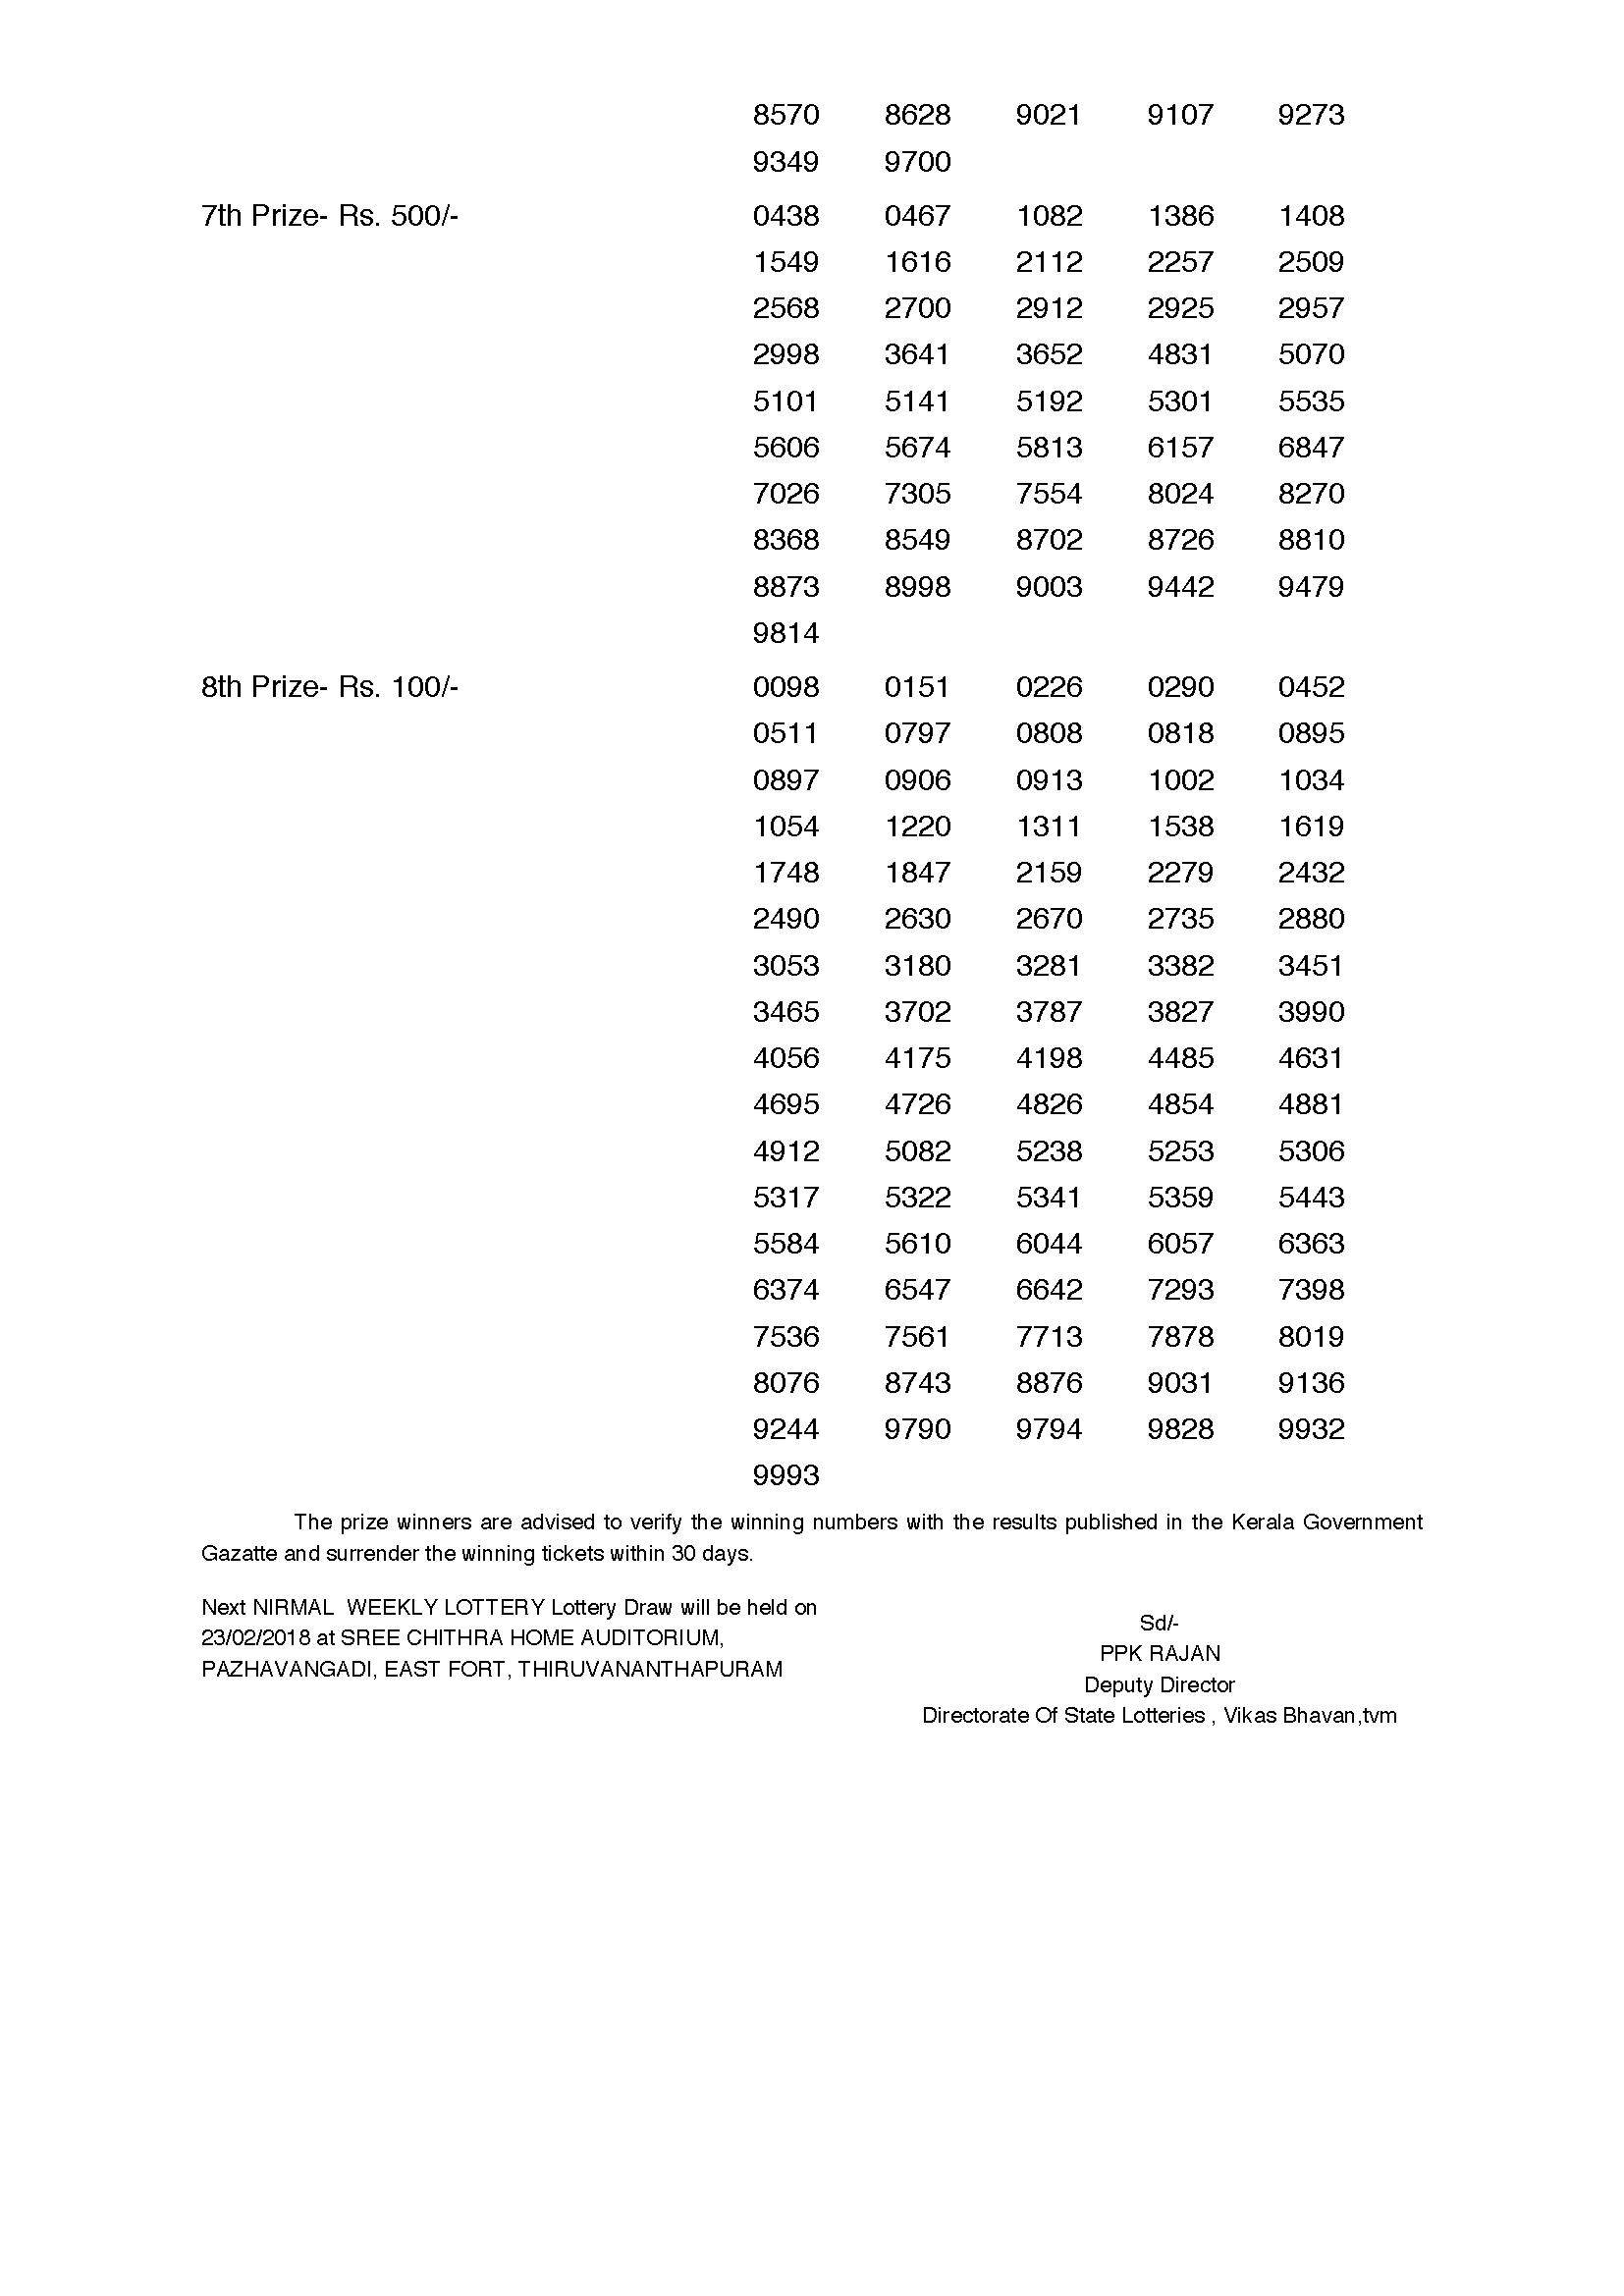 Nirmal NR 56 Kerala Lottery Results - Page 2